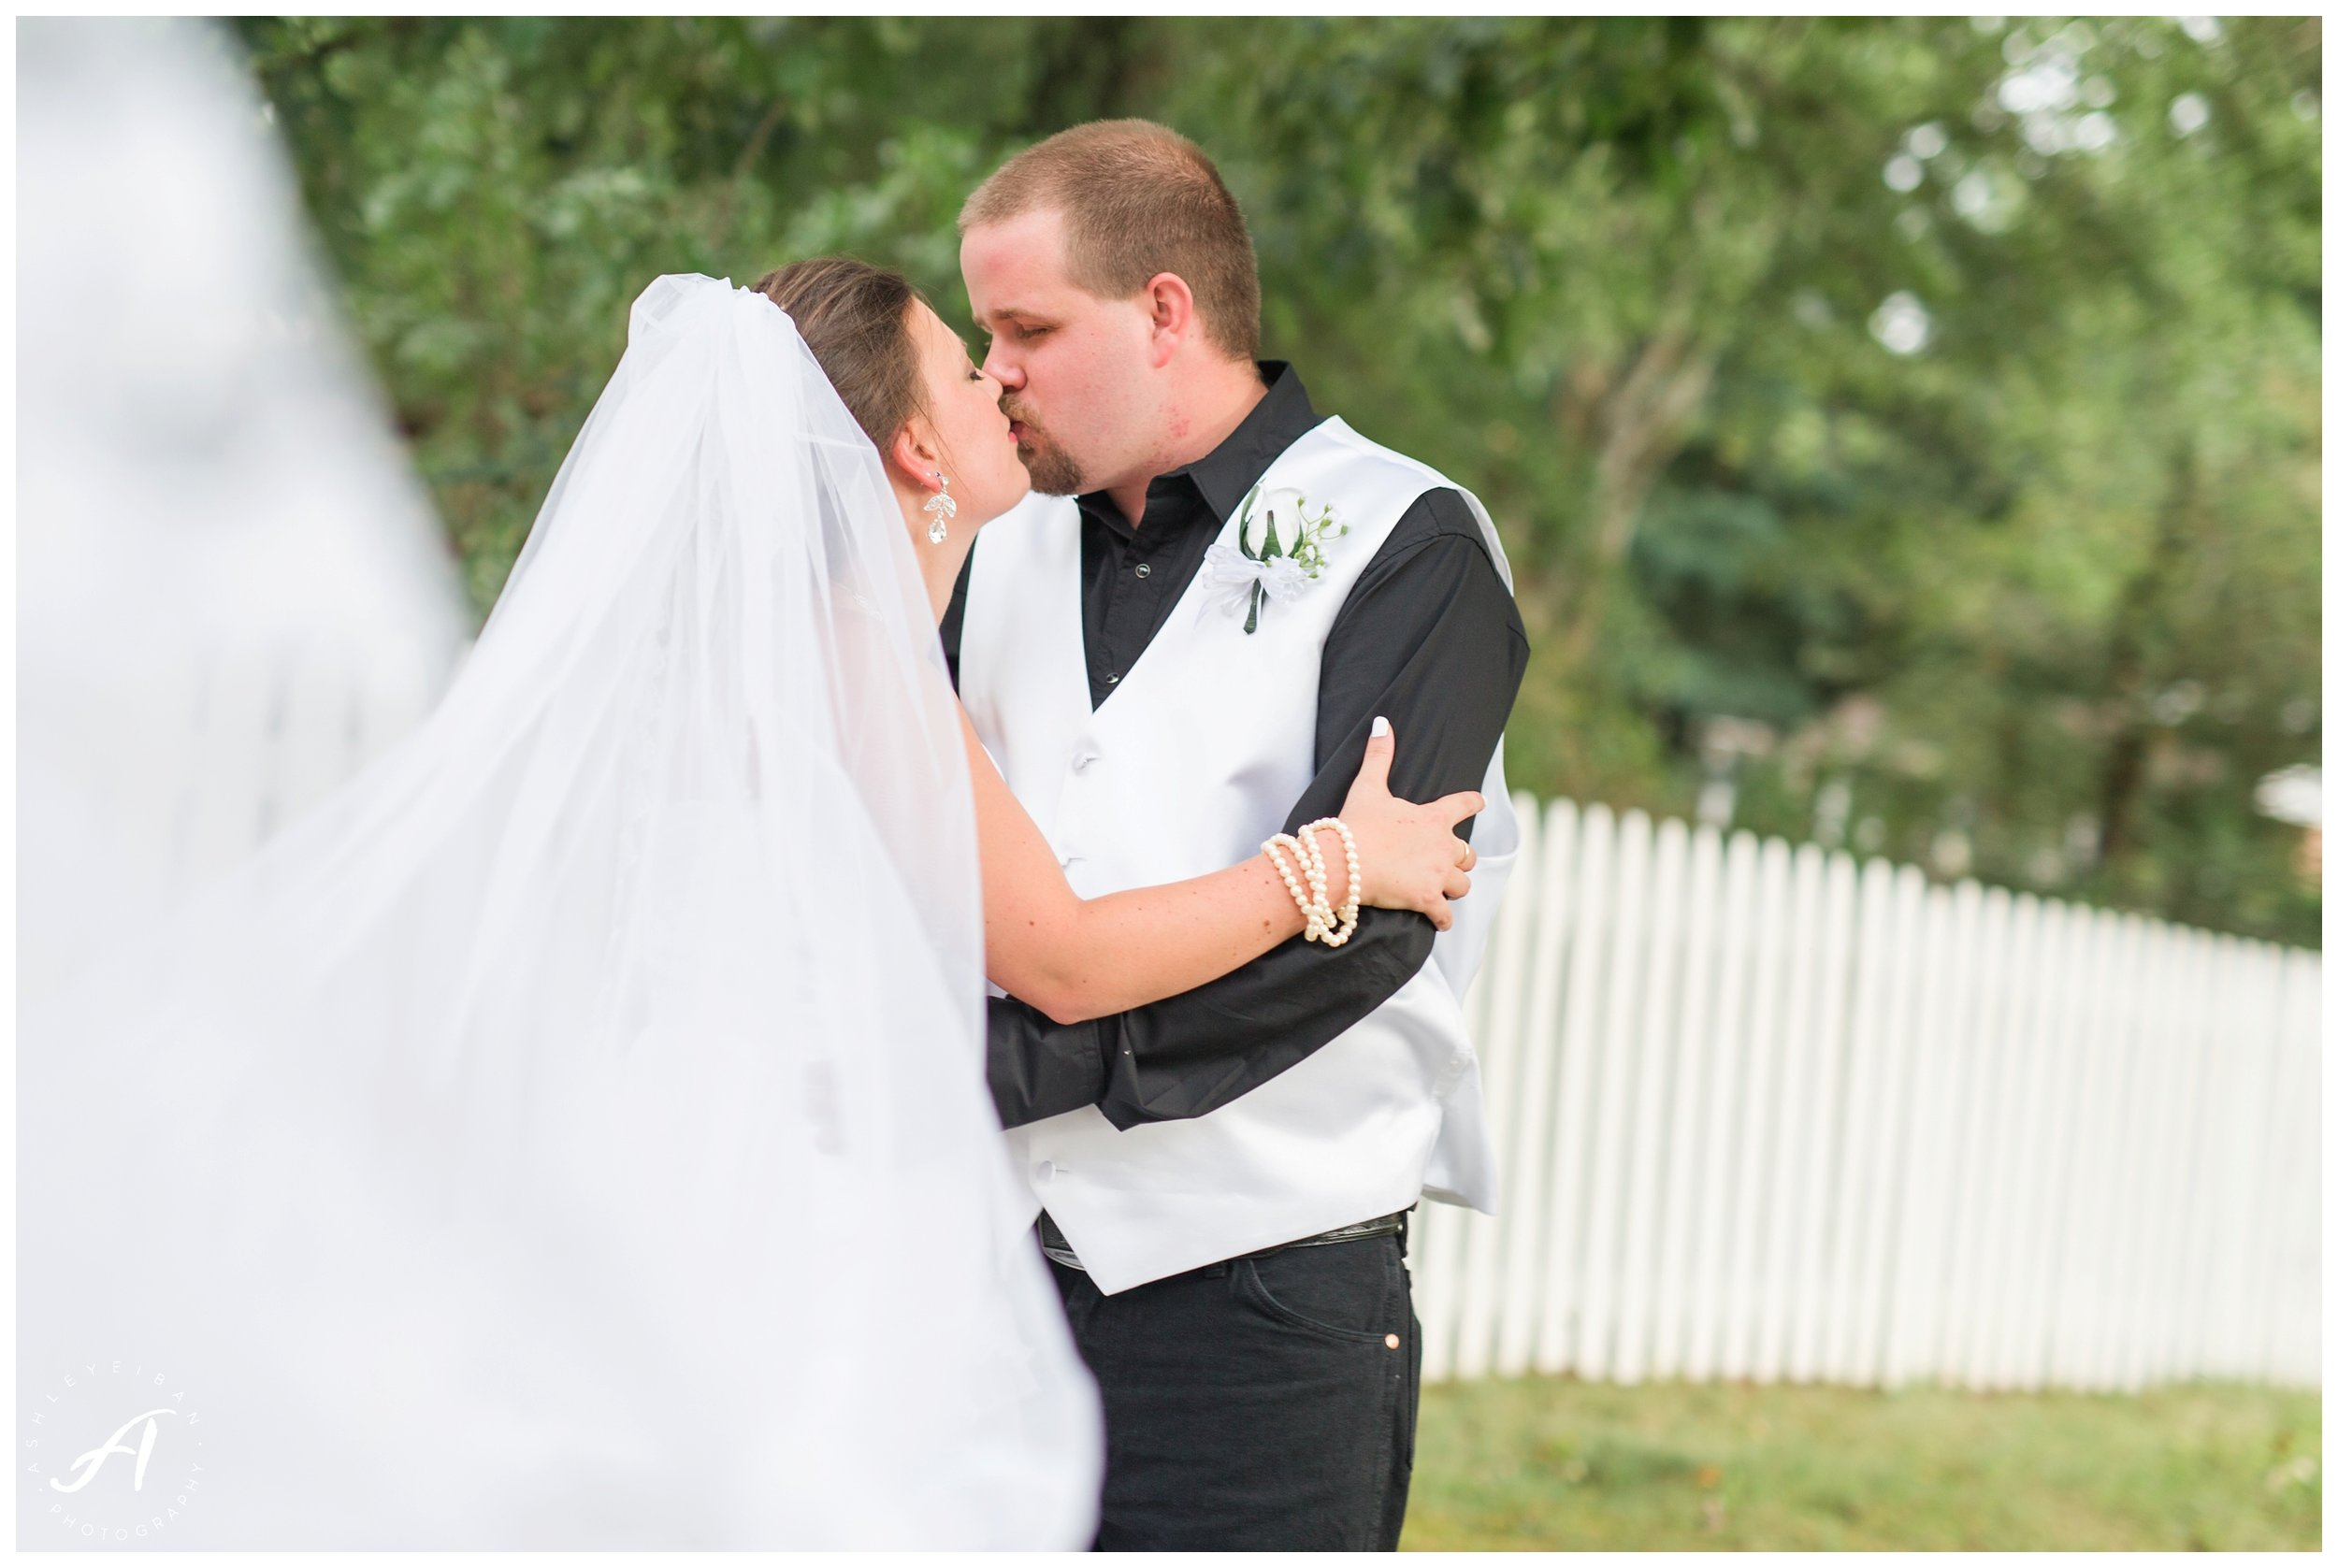 Avoca Museum Wedding || Central VA Wedding || Lynchburg Virginia Wedding Photographer || www.ashleyeiban.com